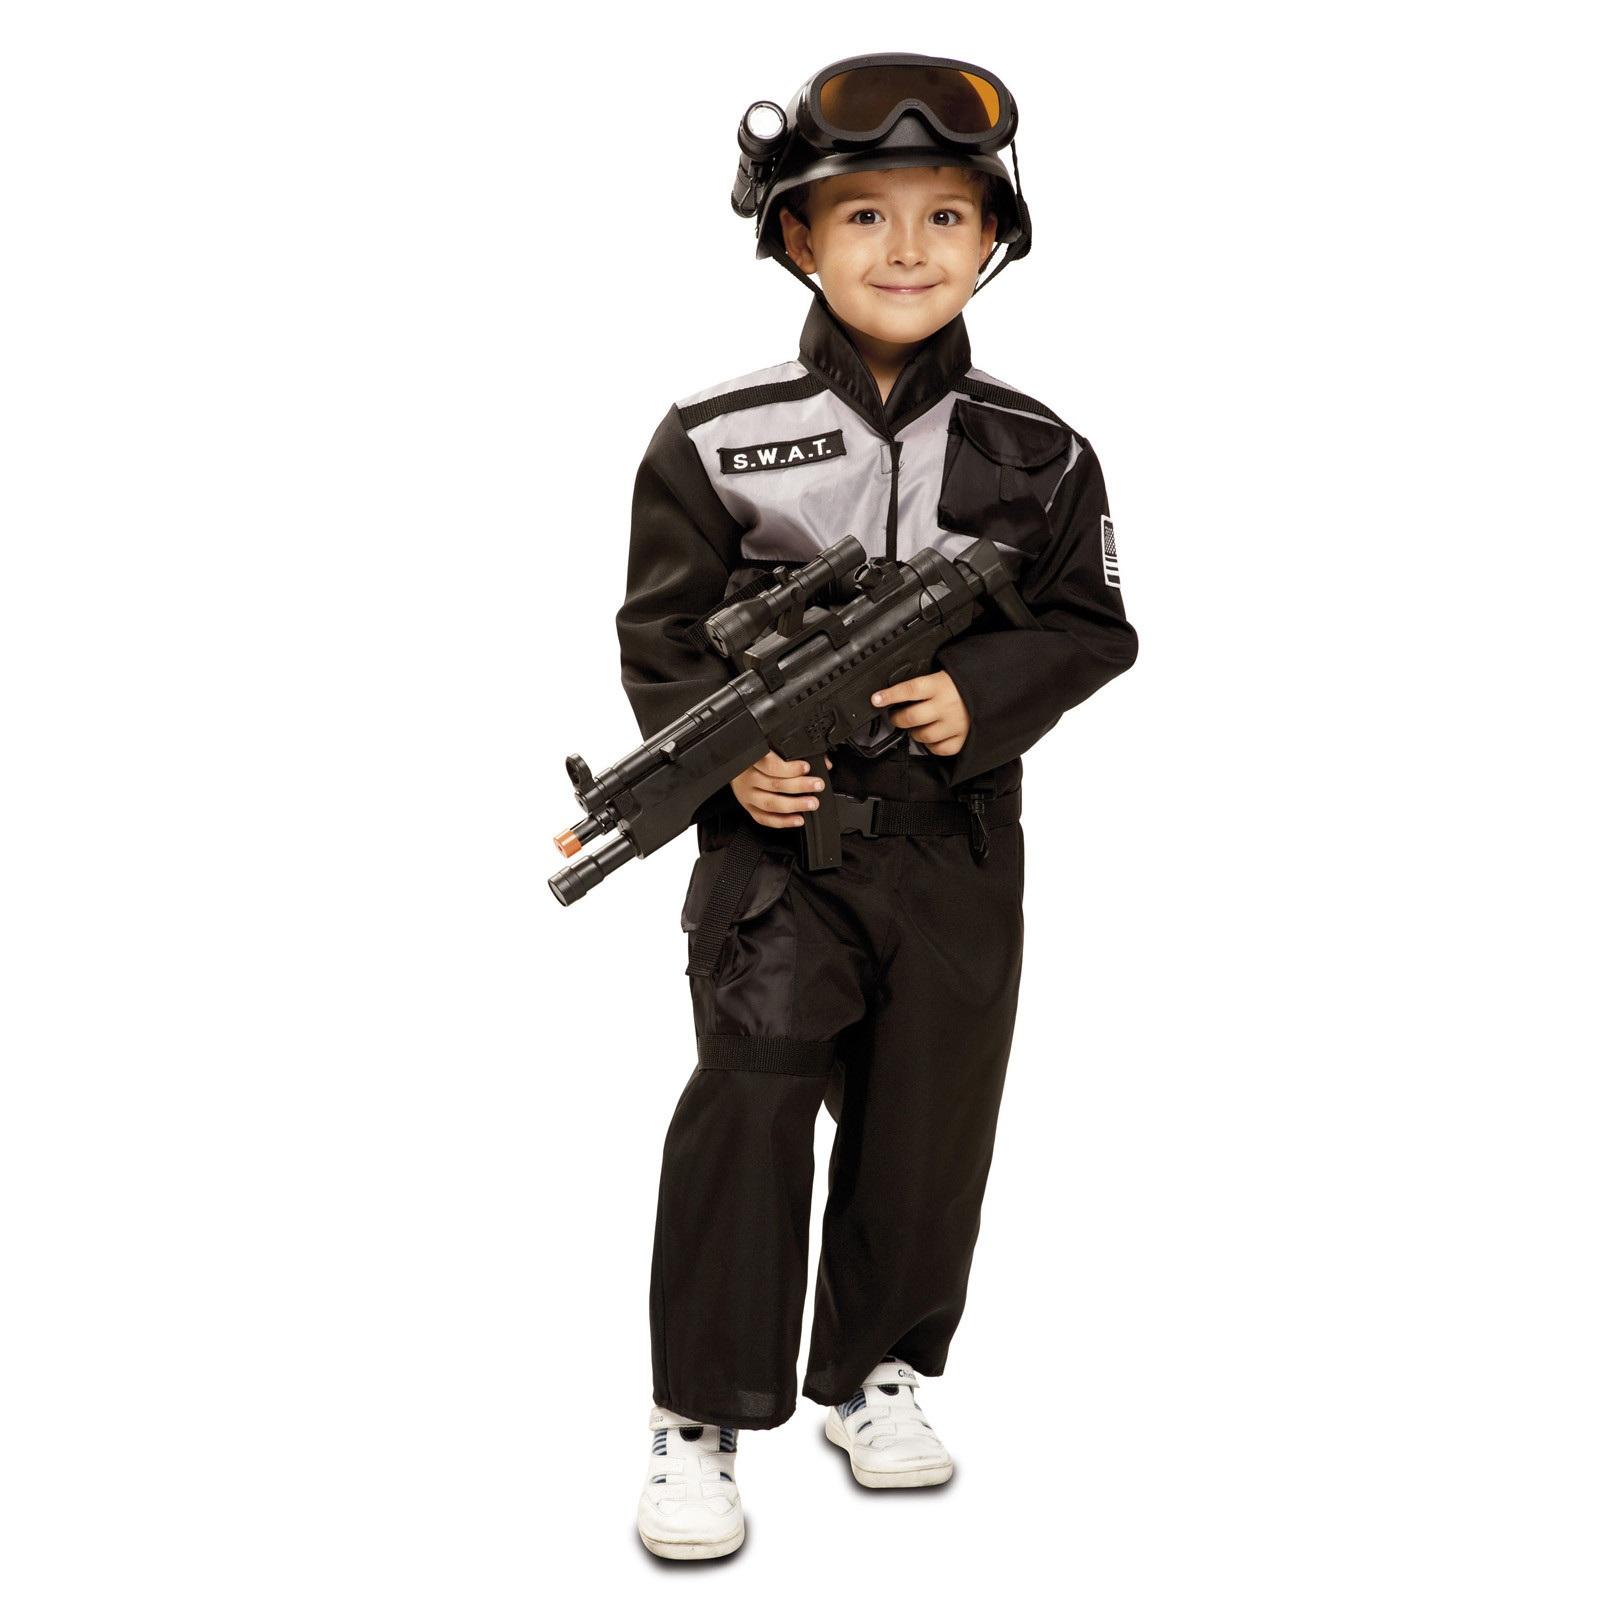 disfraz swat niño 202665mom - DISFRAZ DE SWAT NIÑO